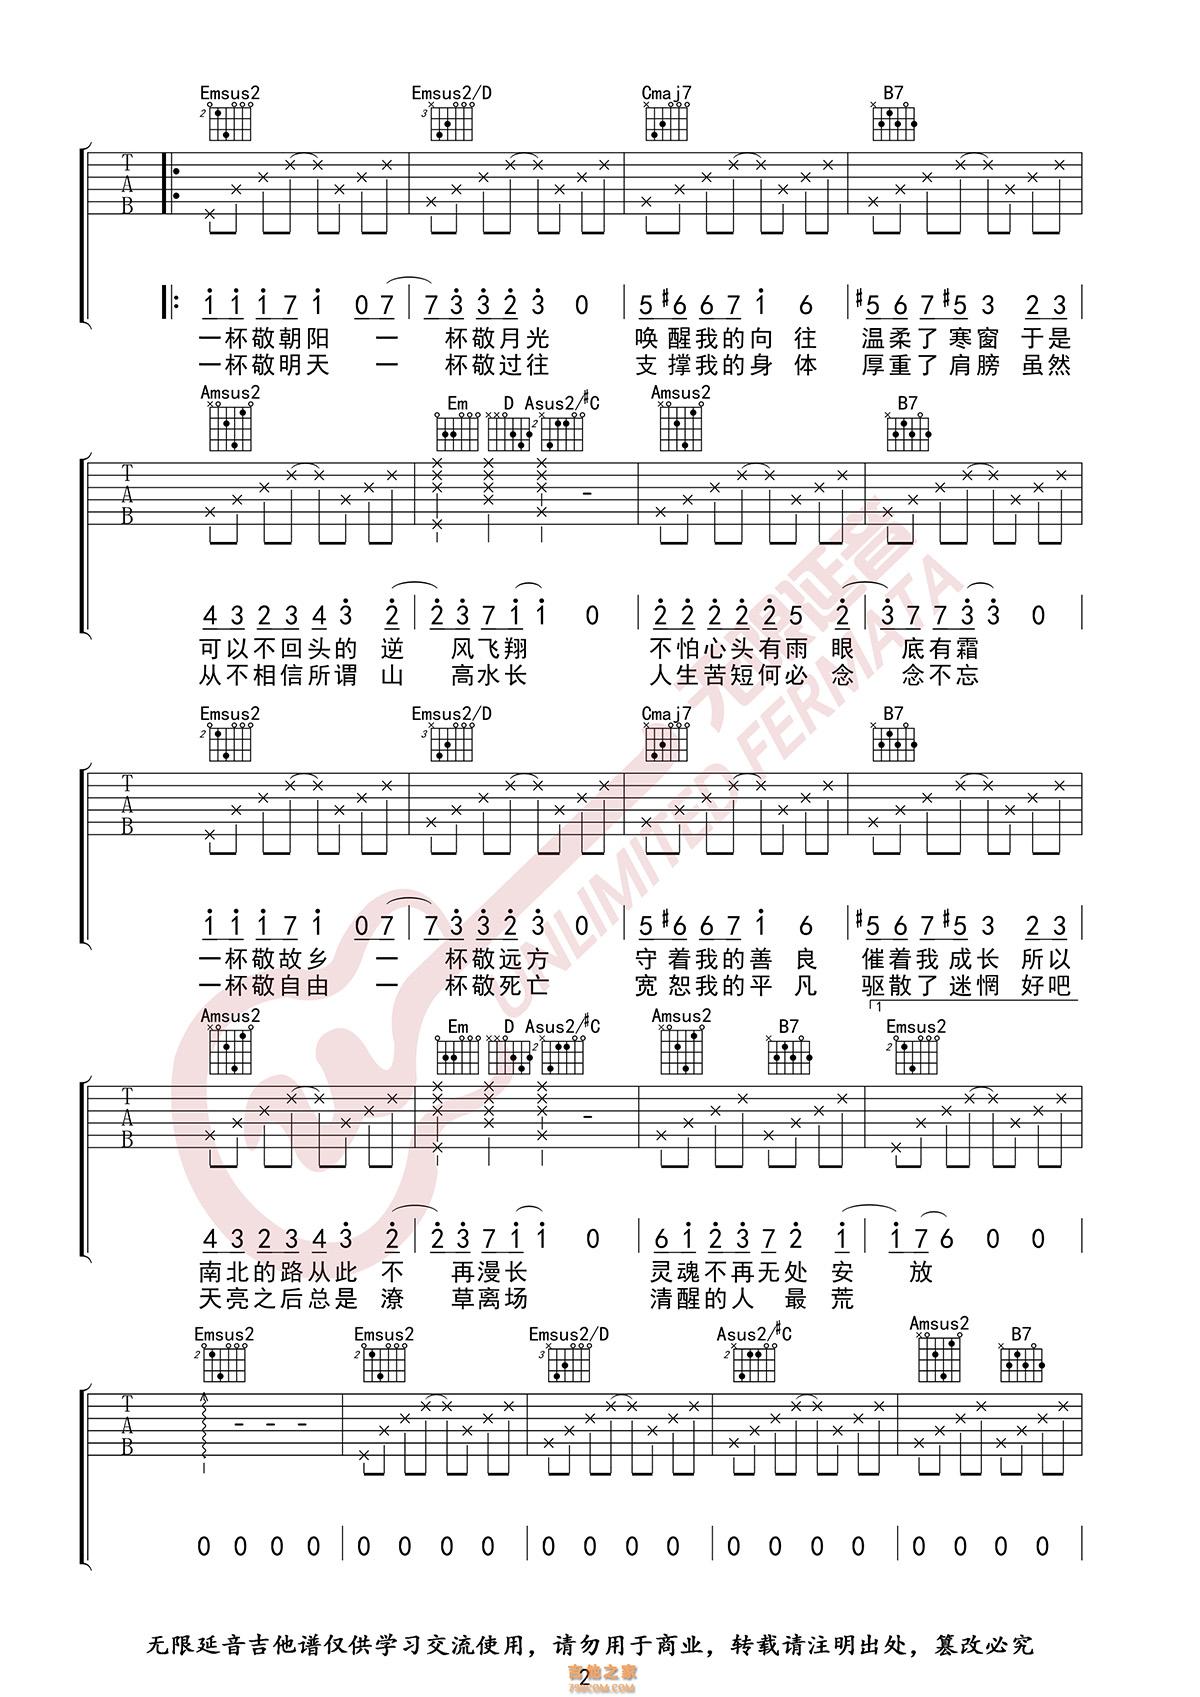 a调吉他谱,b调吉他谱,txt吉他谱版,gtp吉他谱版,简谱,尤克里里谱,六线